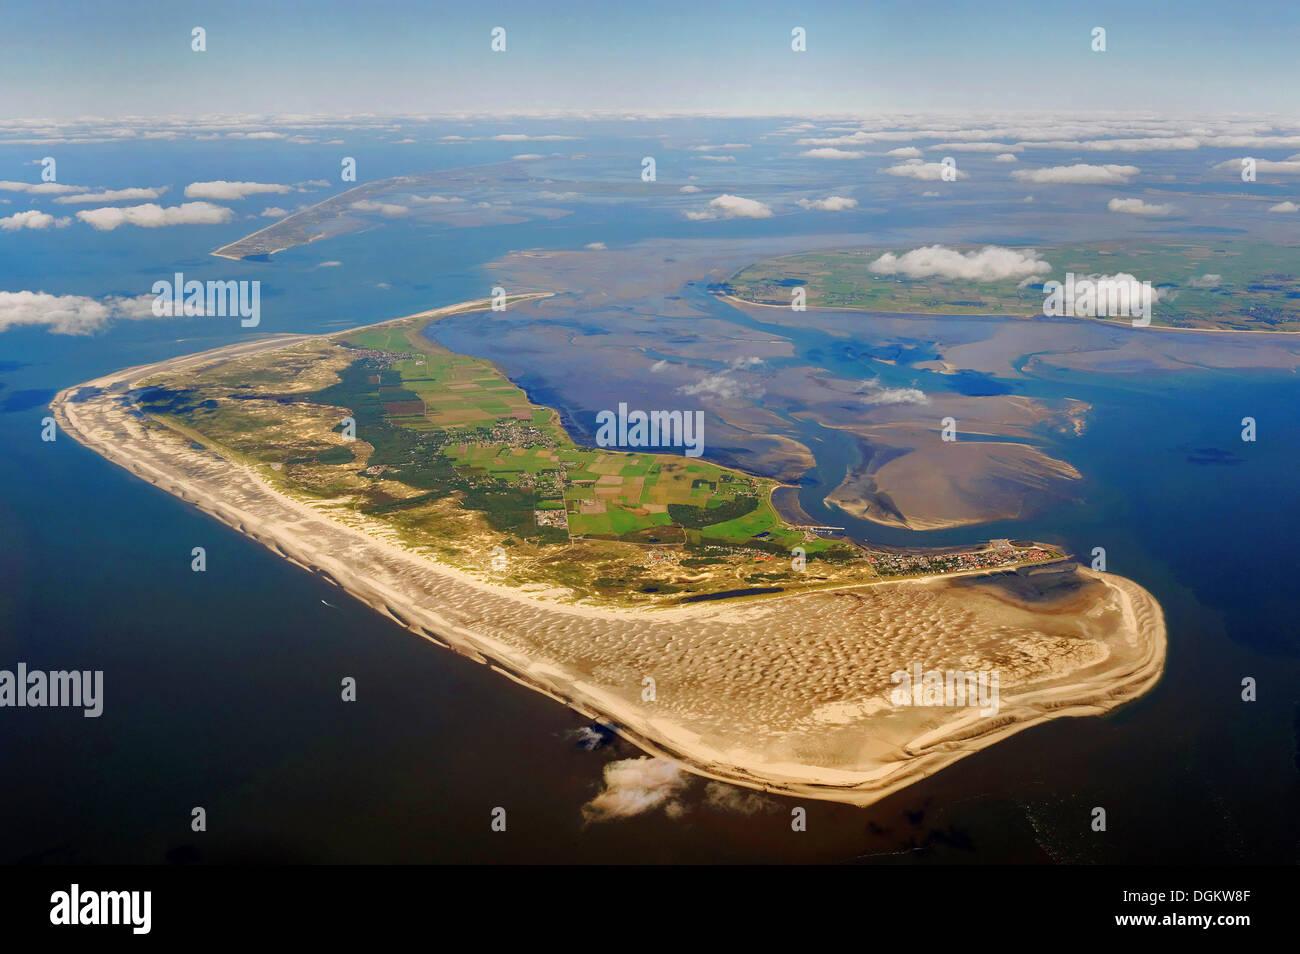 Where To Buy An Island